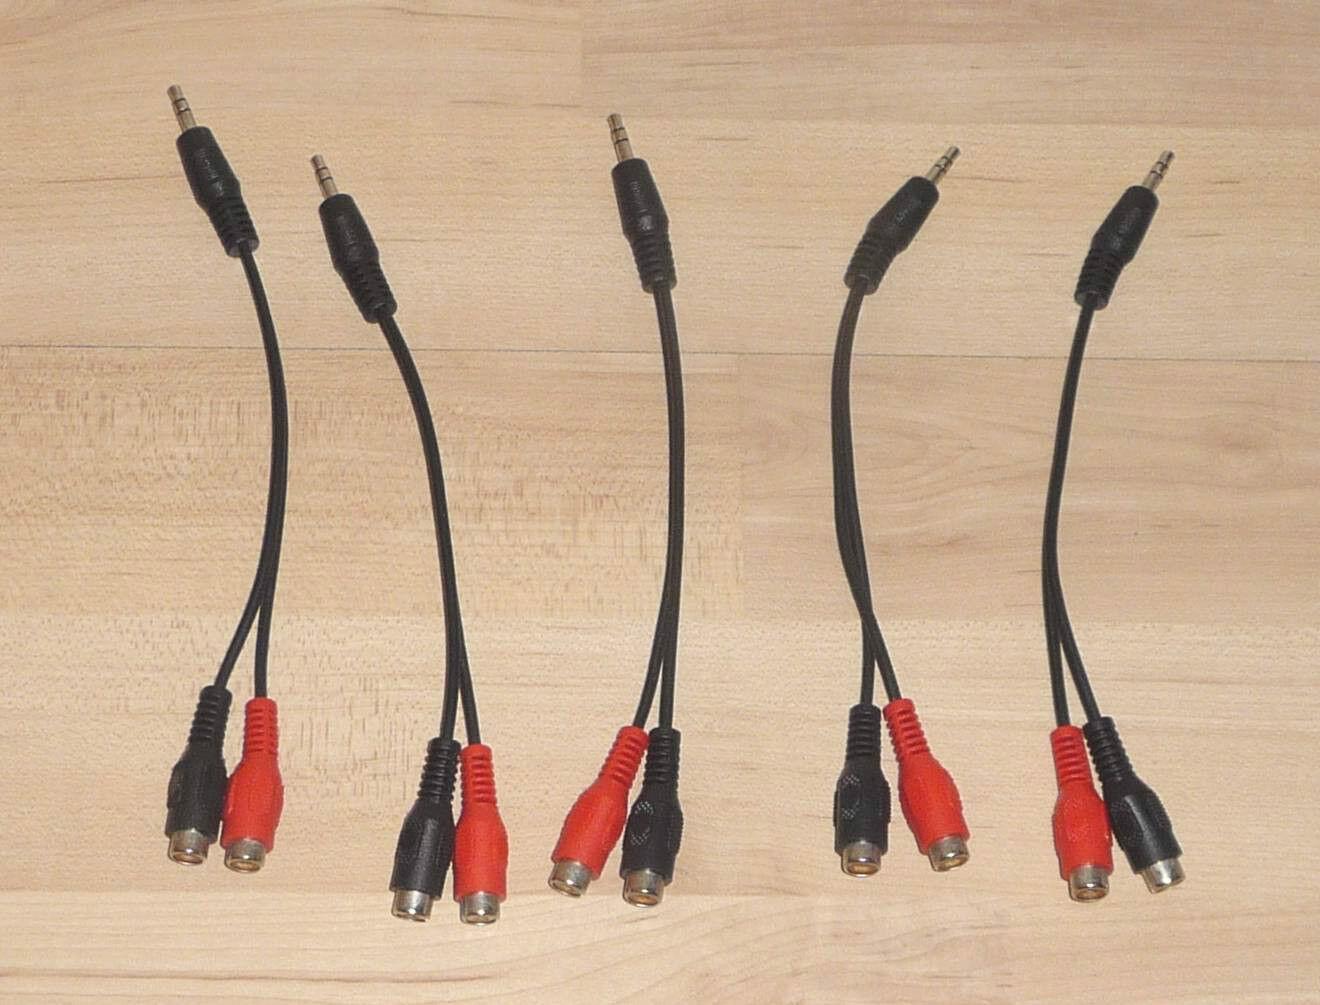 5x Chinch Plug Rca Adapter Distributor Plug Mobile Phone MP3 An Amplifier 3,5mm